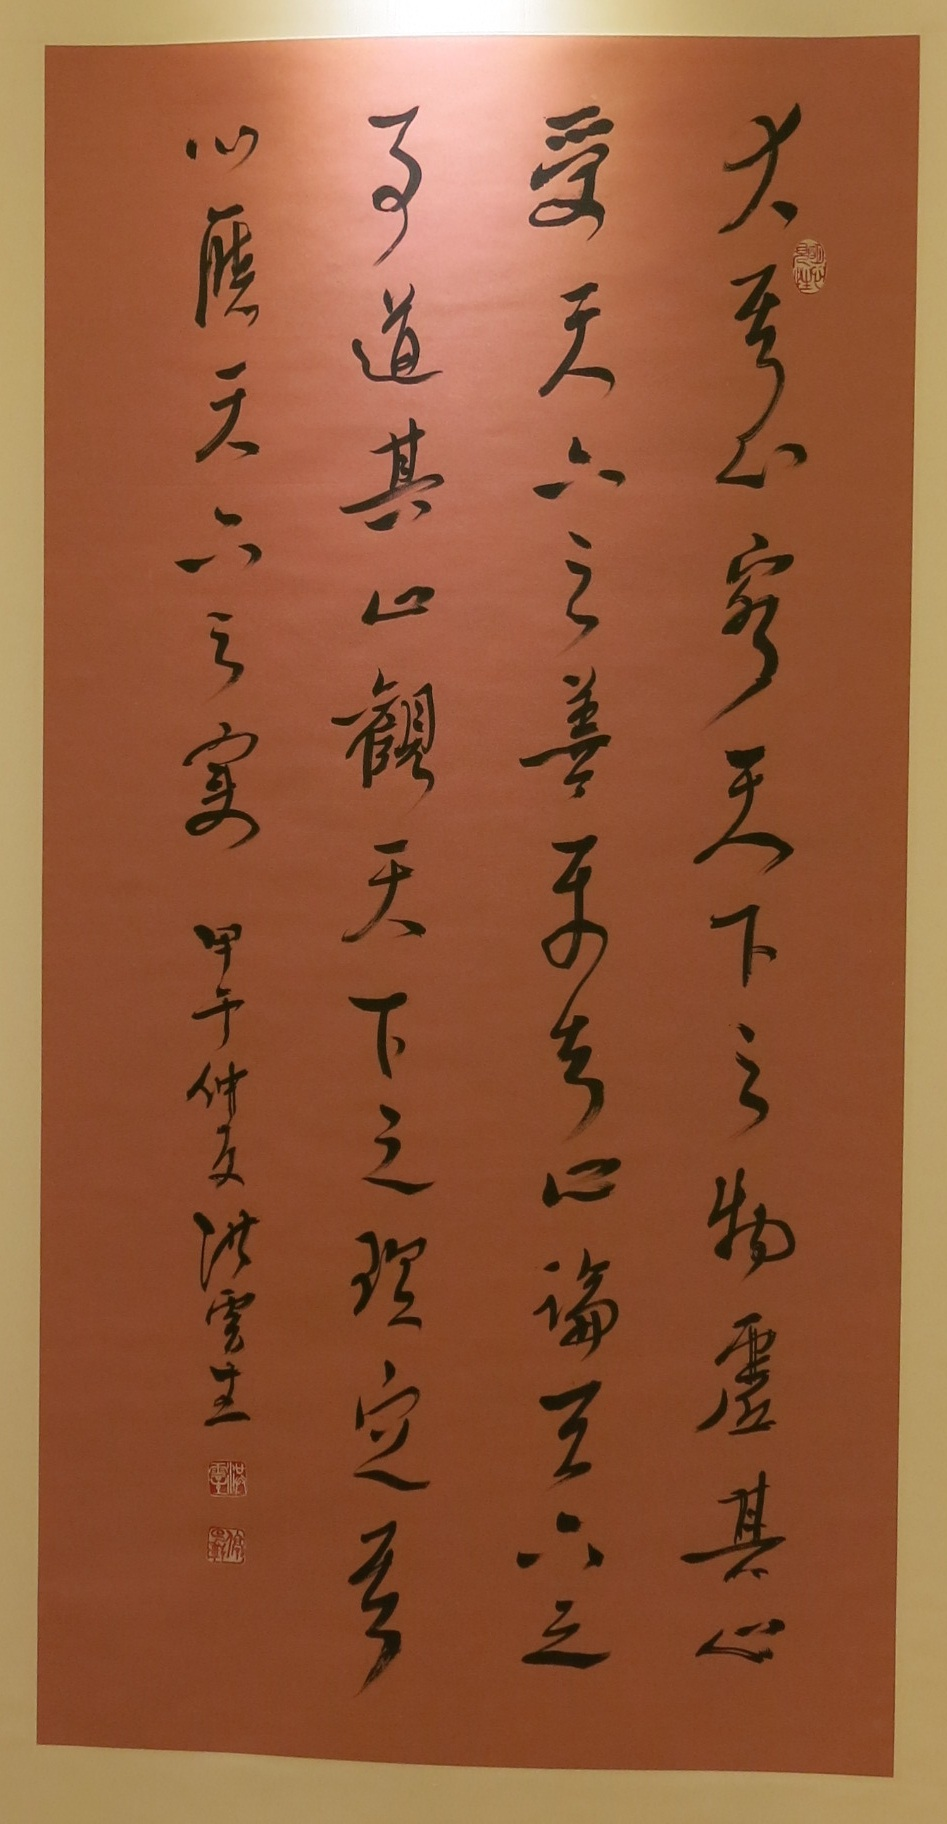 Poem of eight